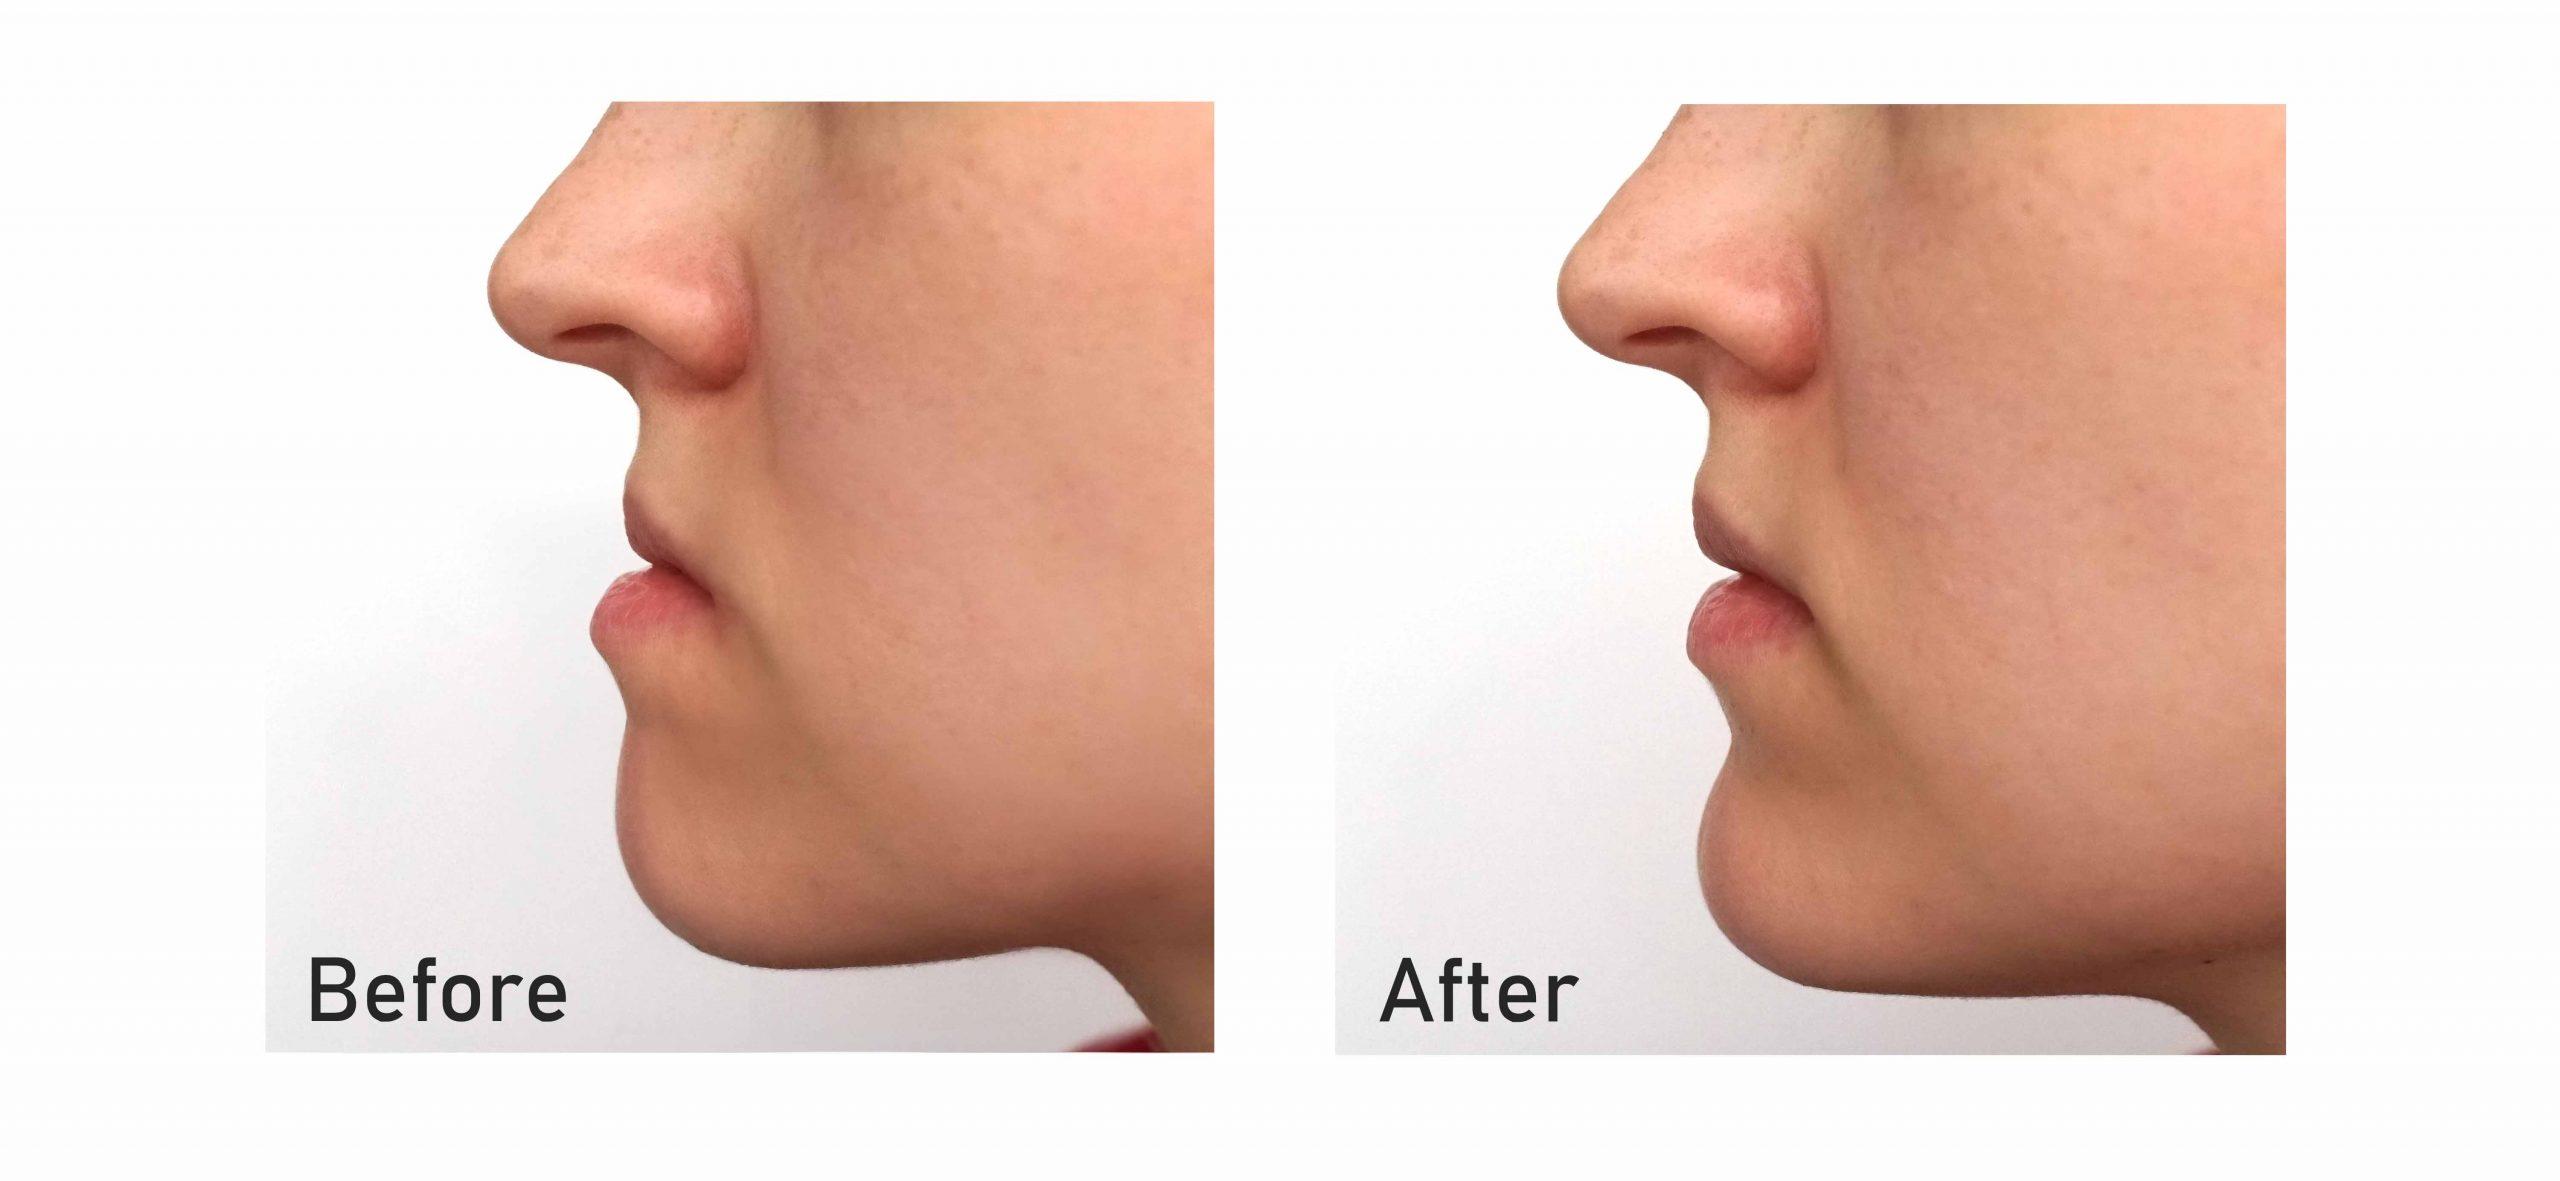 Orthognathic-Surgery-Jaw-Straightening-2